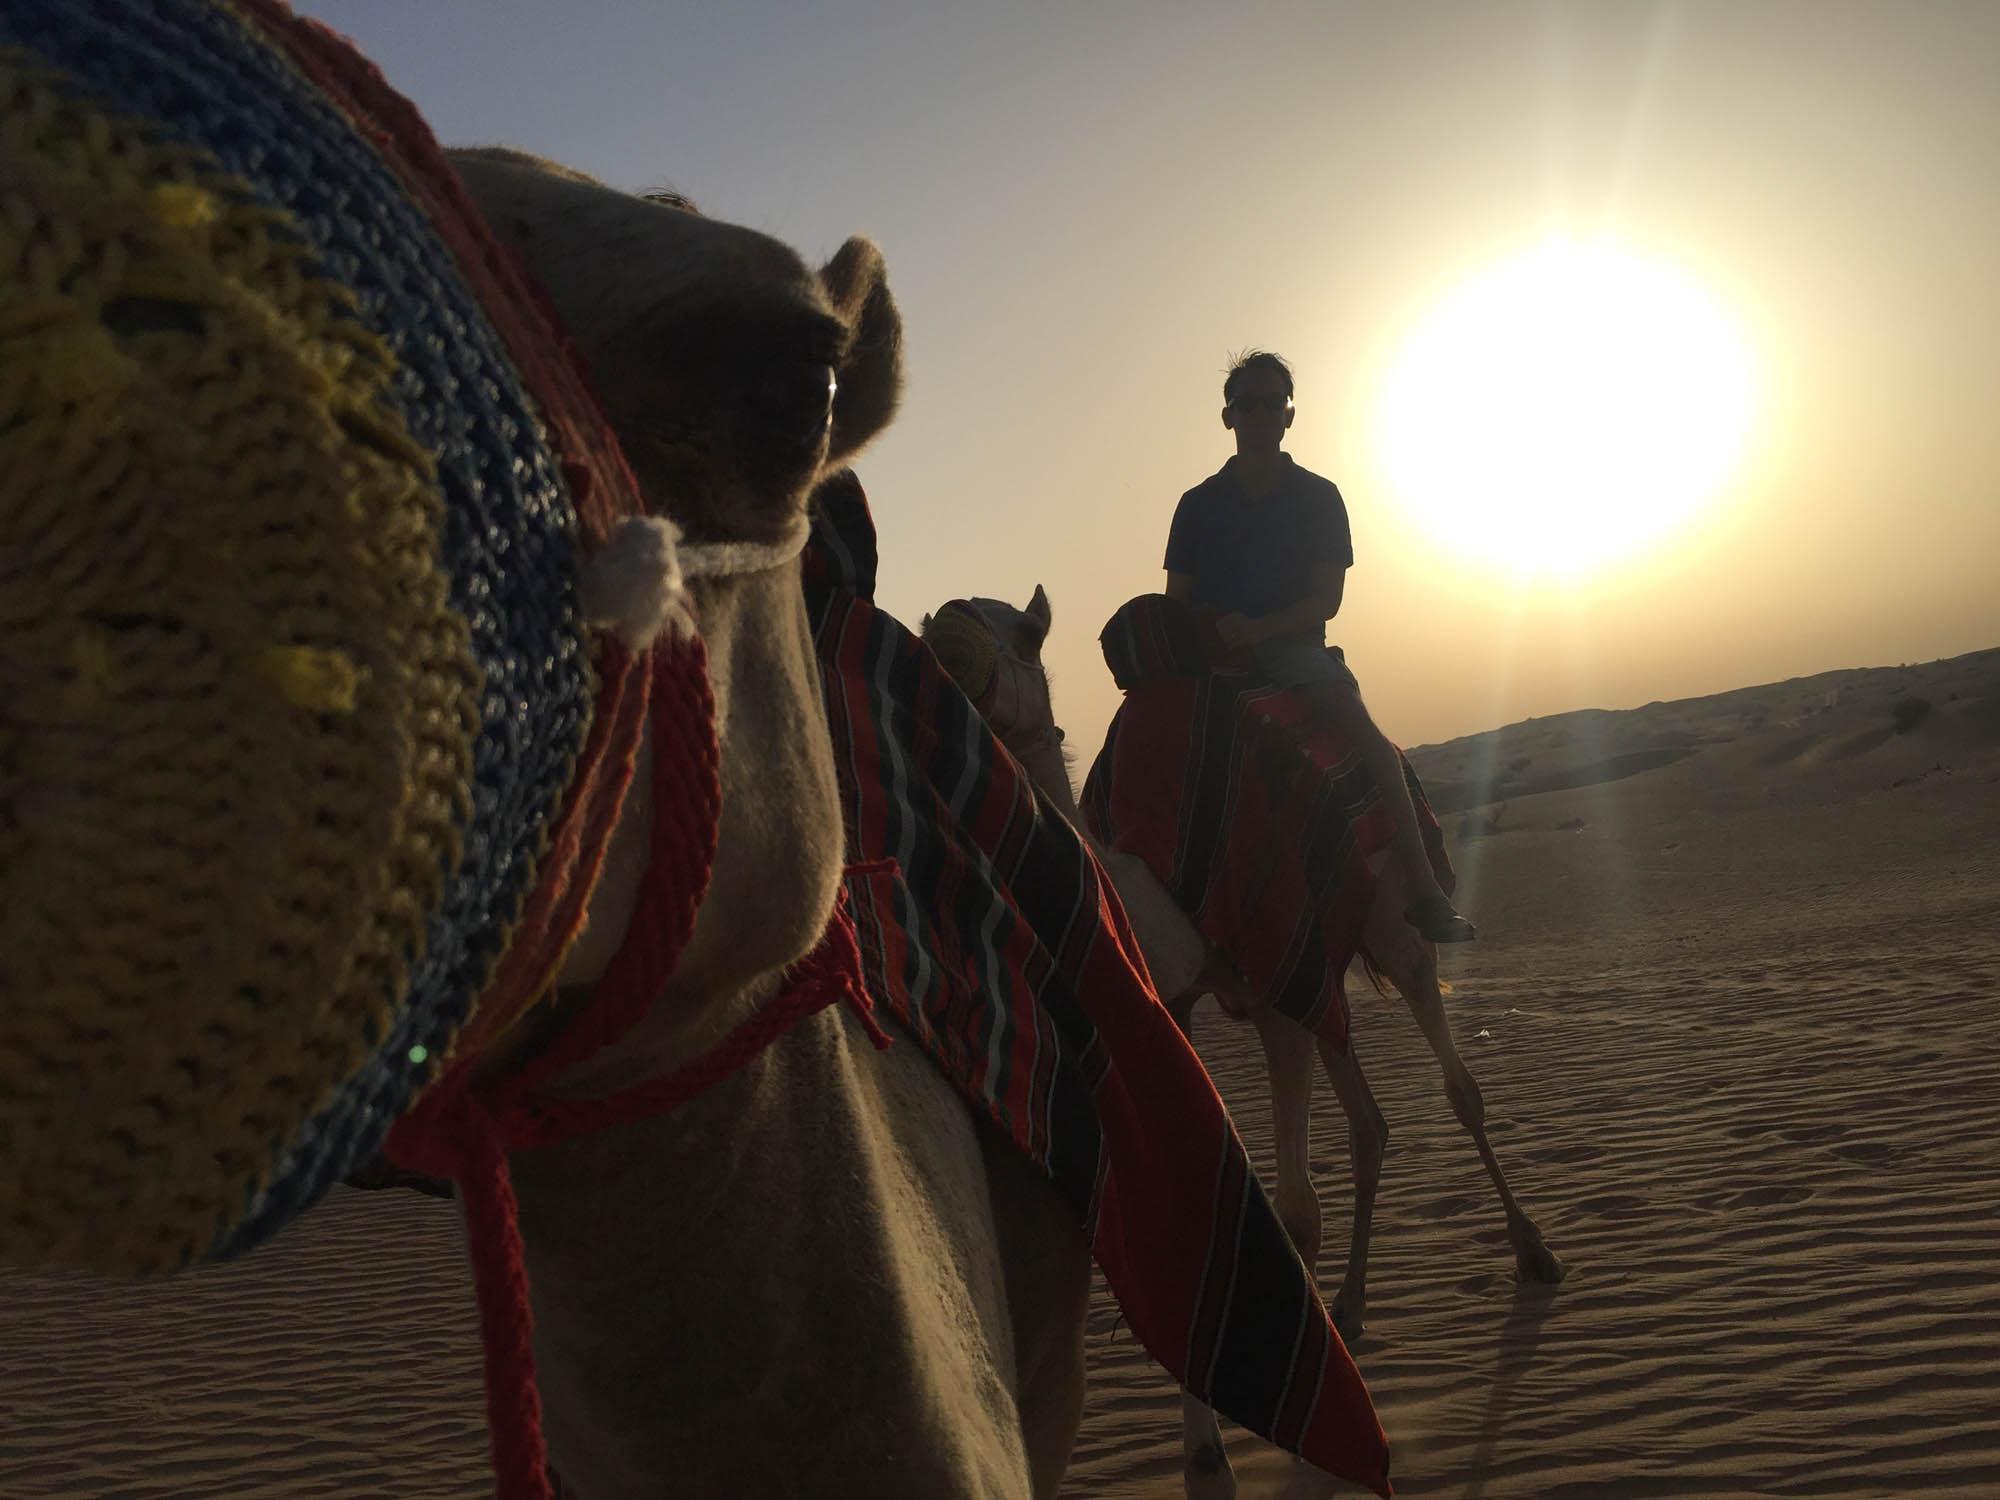 Ökensafari med Knight Tours i Dubai